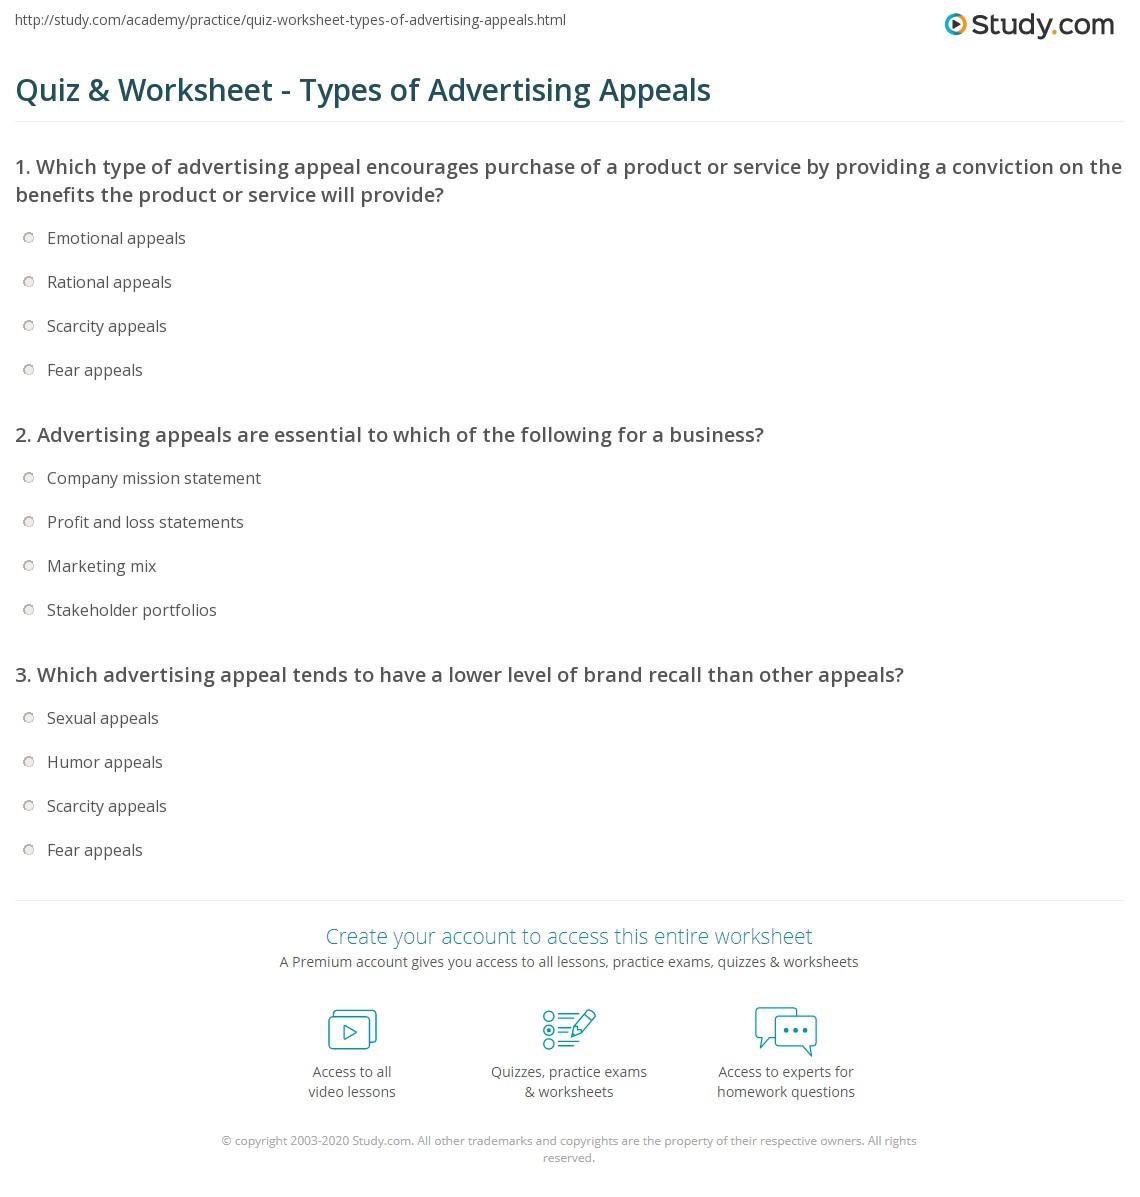 Quiz & Worksheet - Types of Advertising Appeals | Study.com